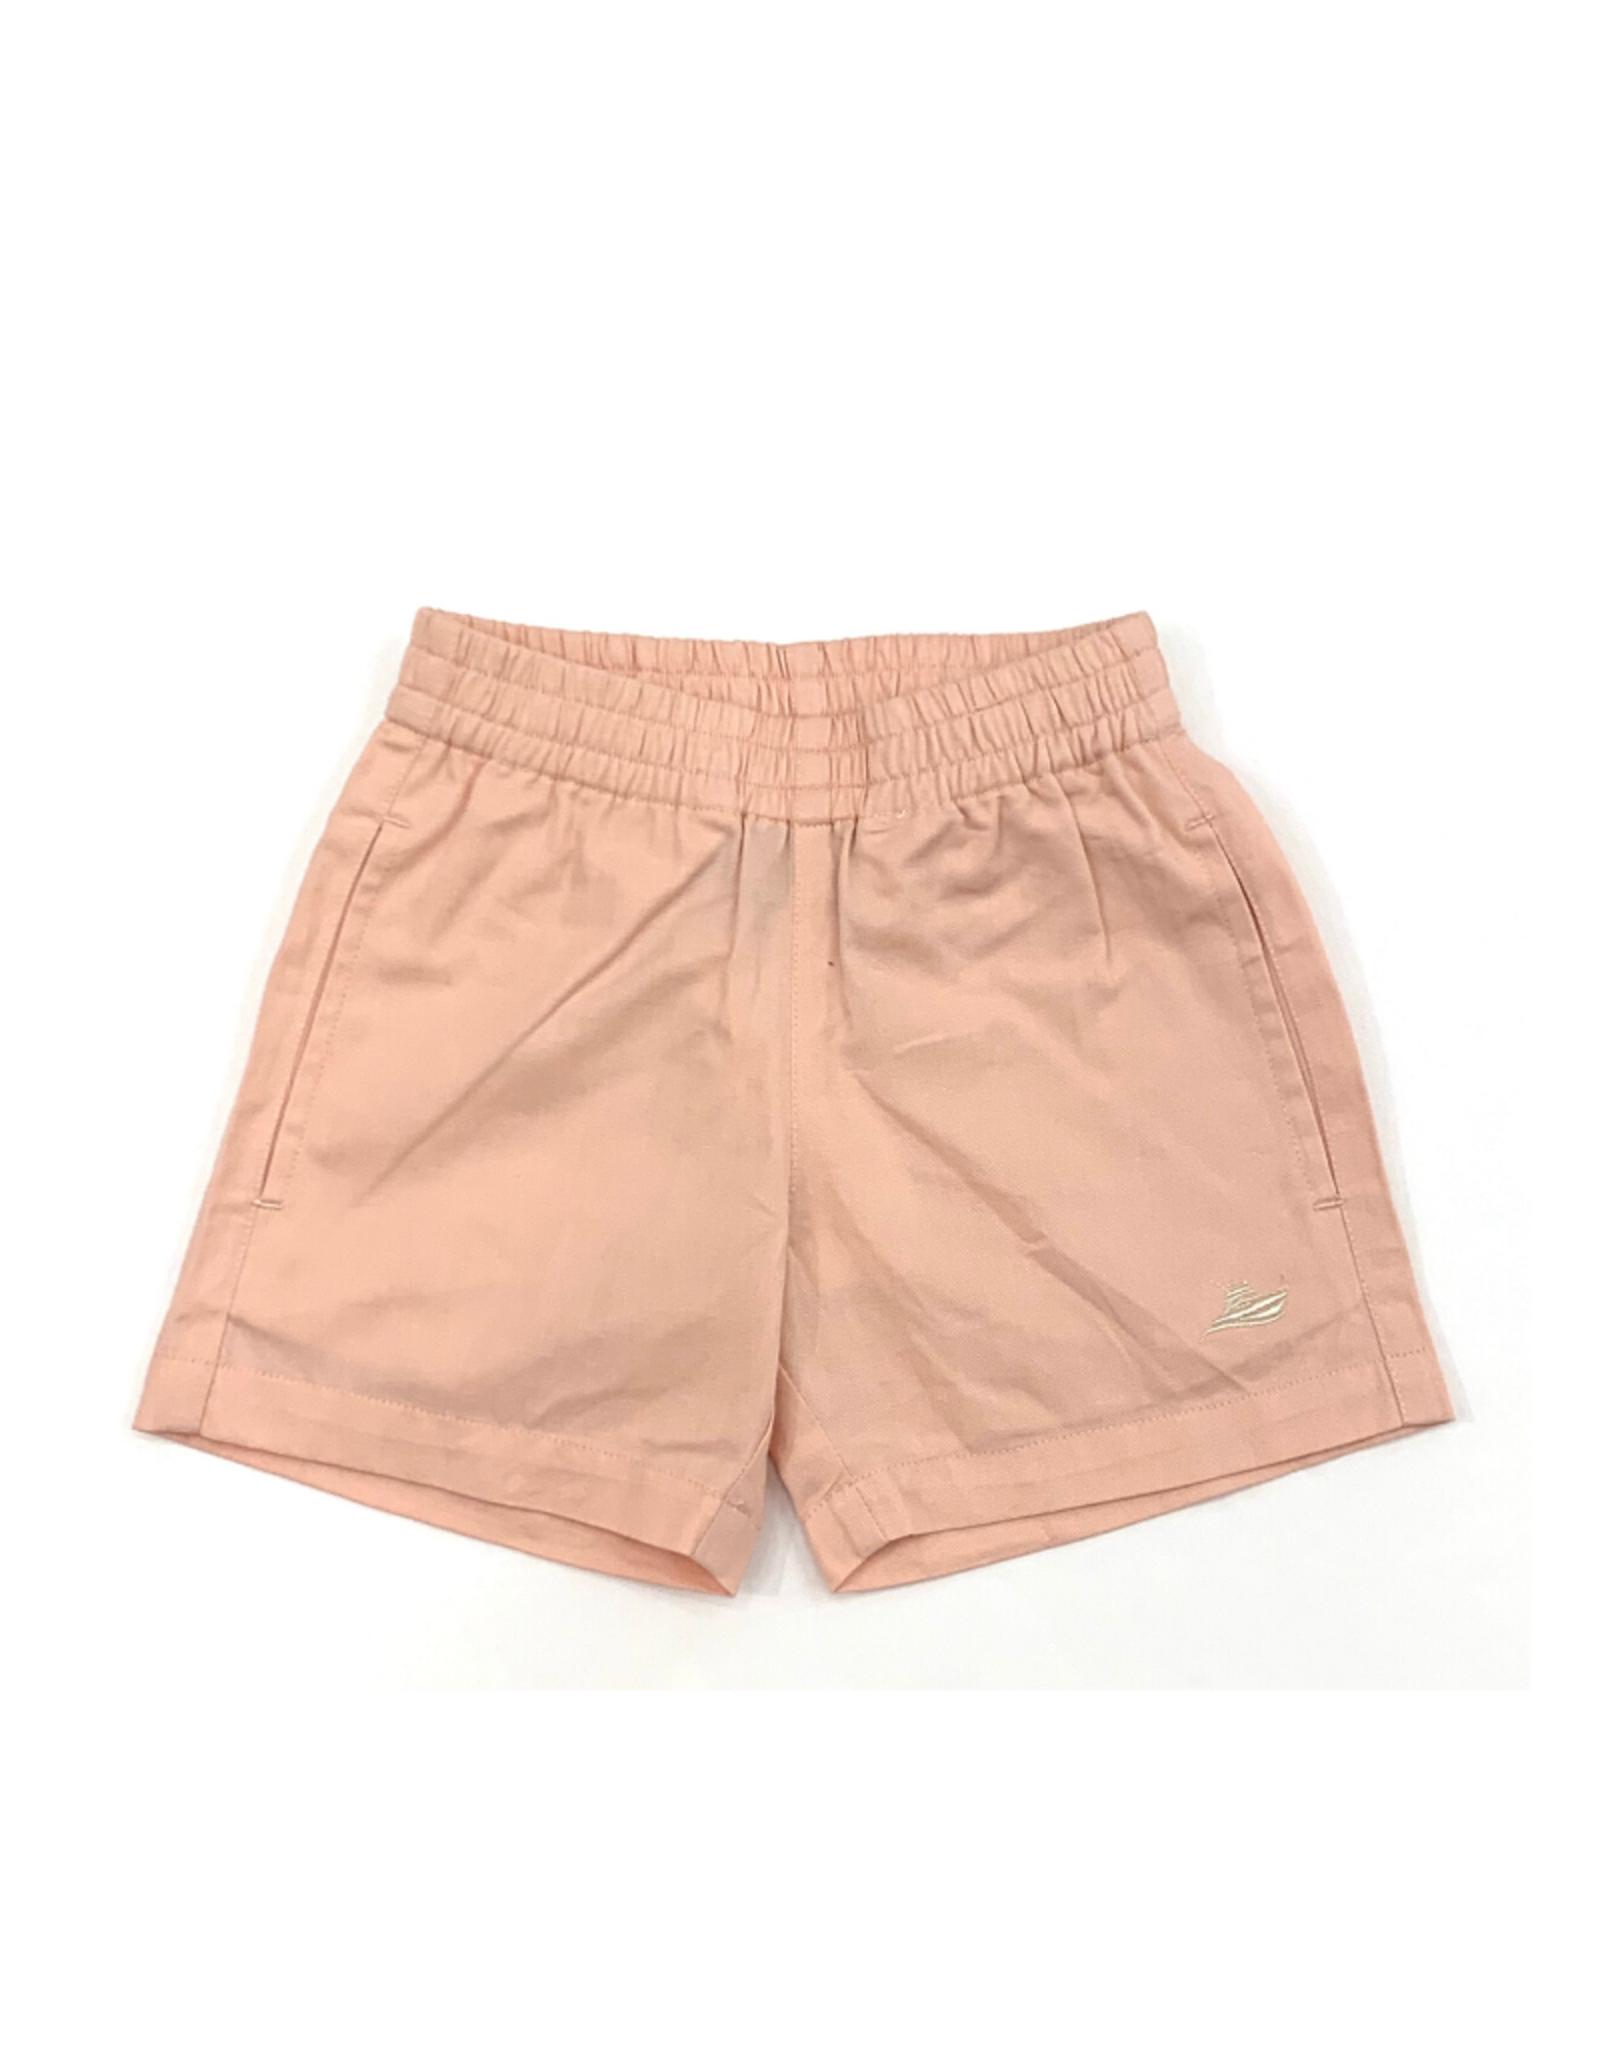 SouthBound Pink Elastic Waistband Shorts